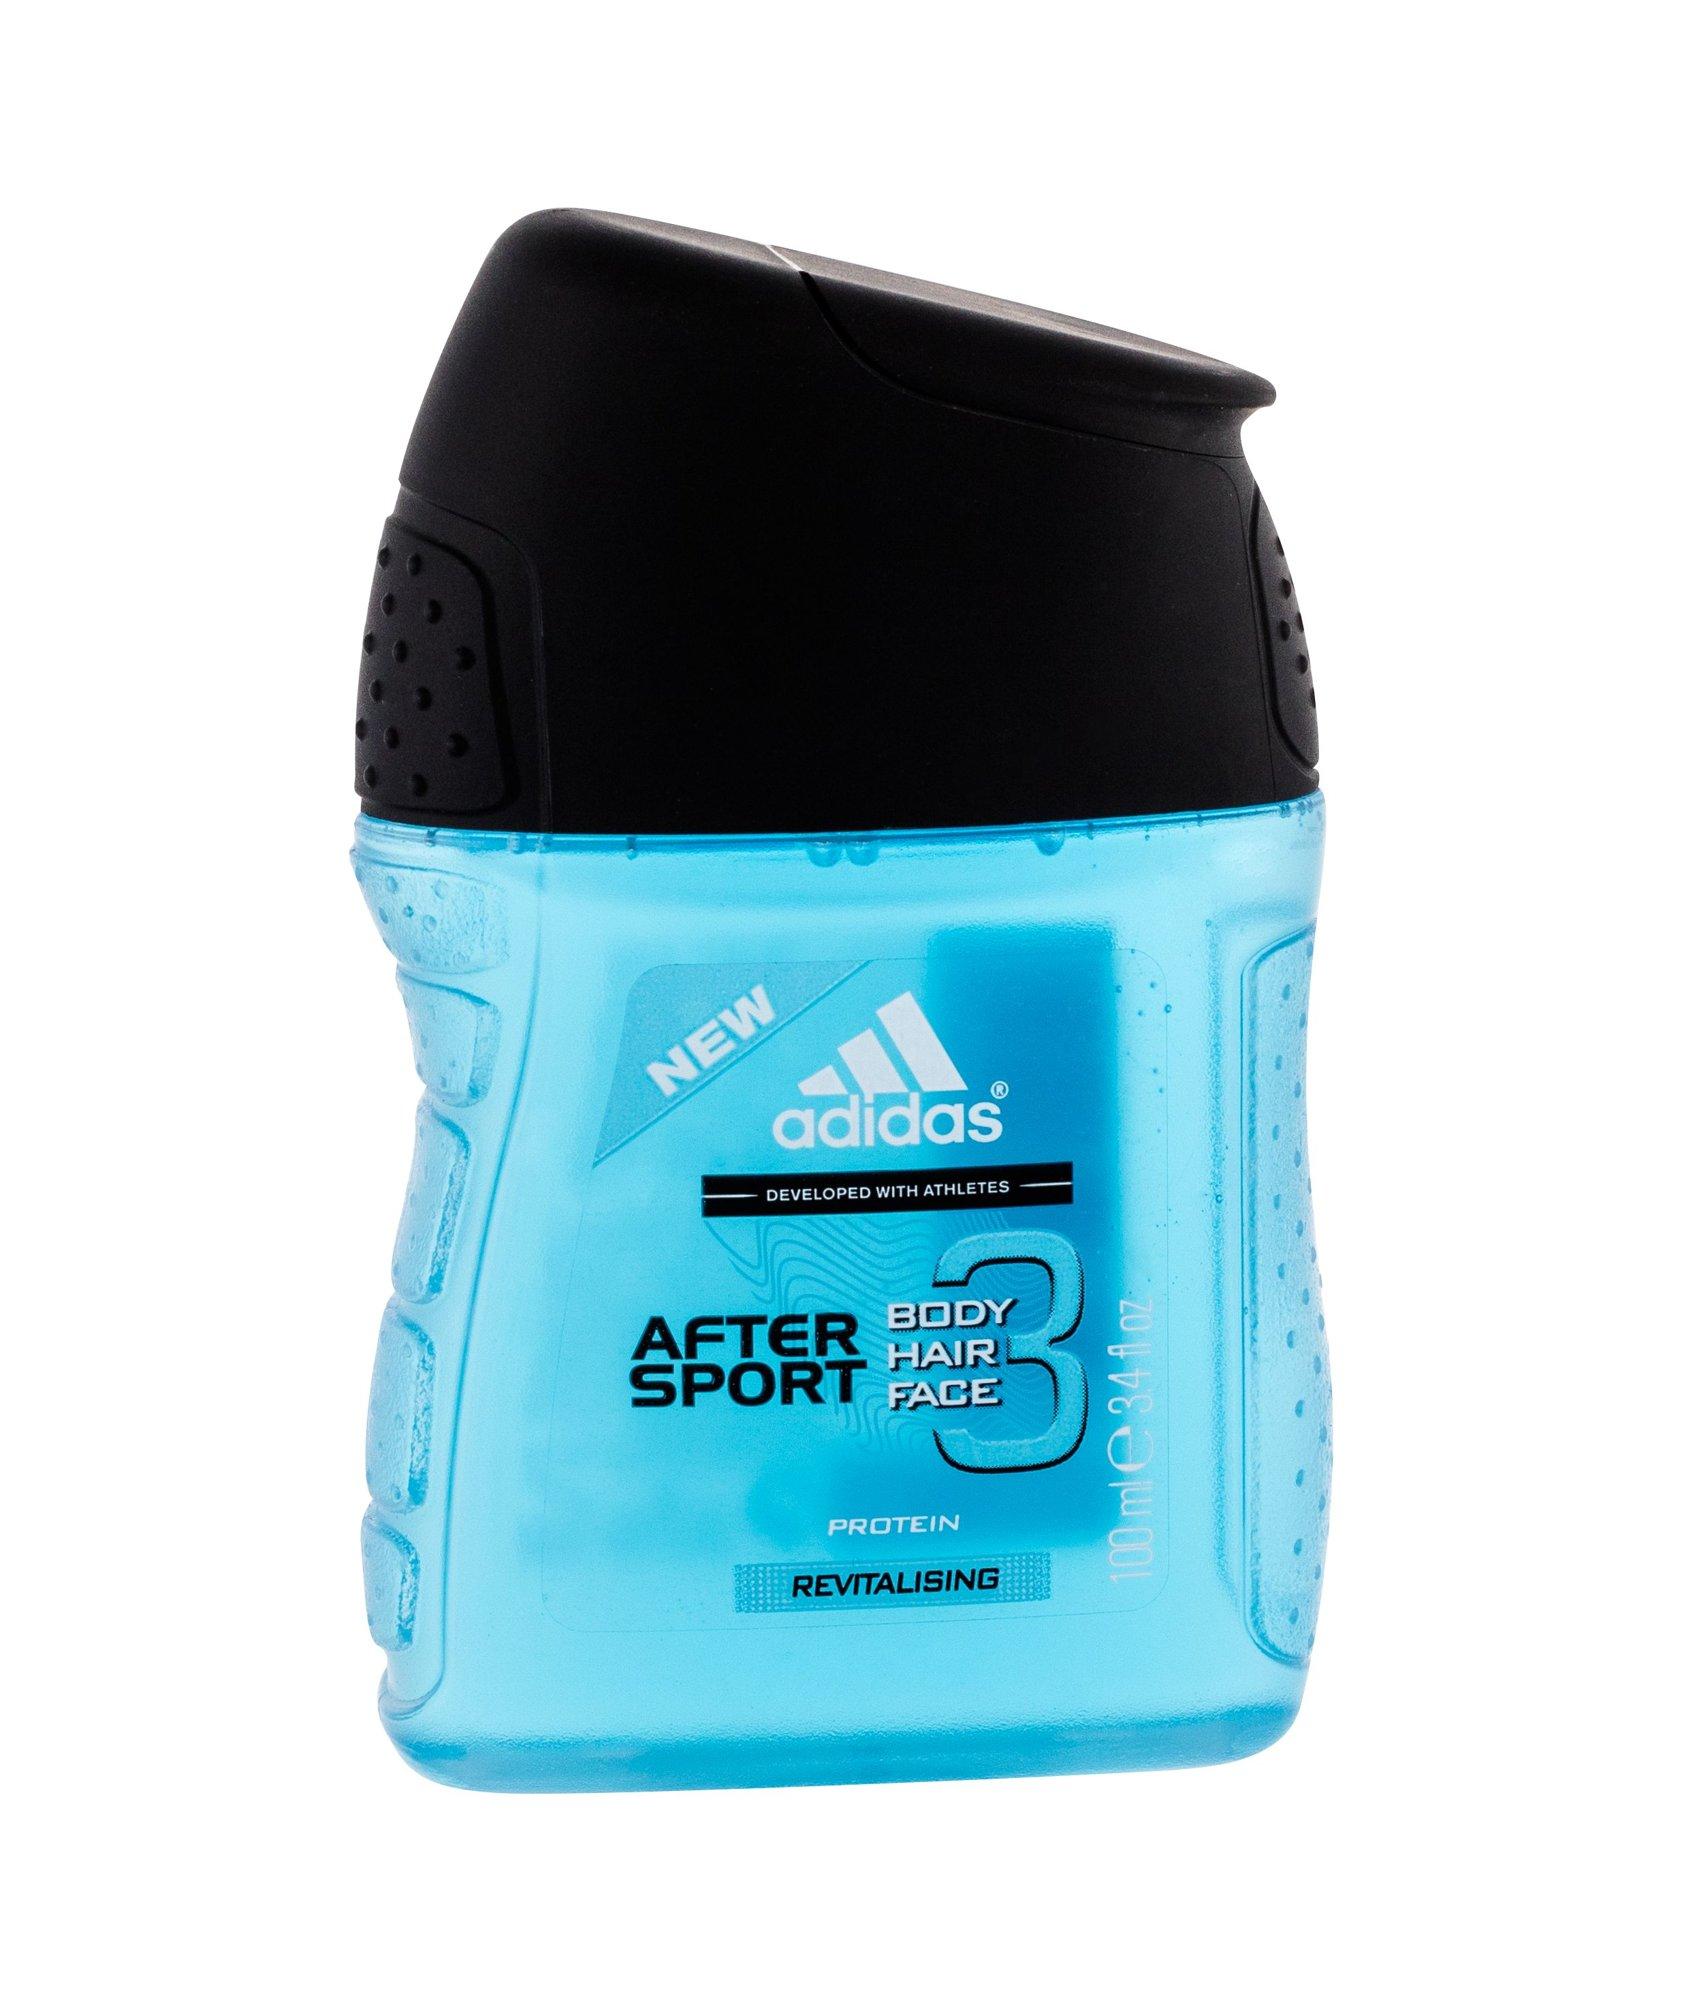 Adidas After Sport Shower Gel 100ml